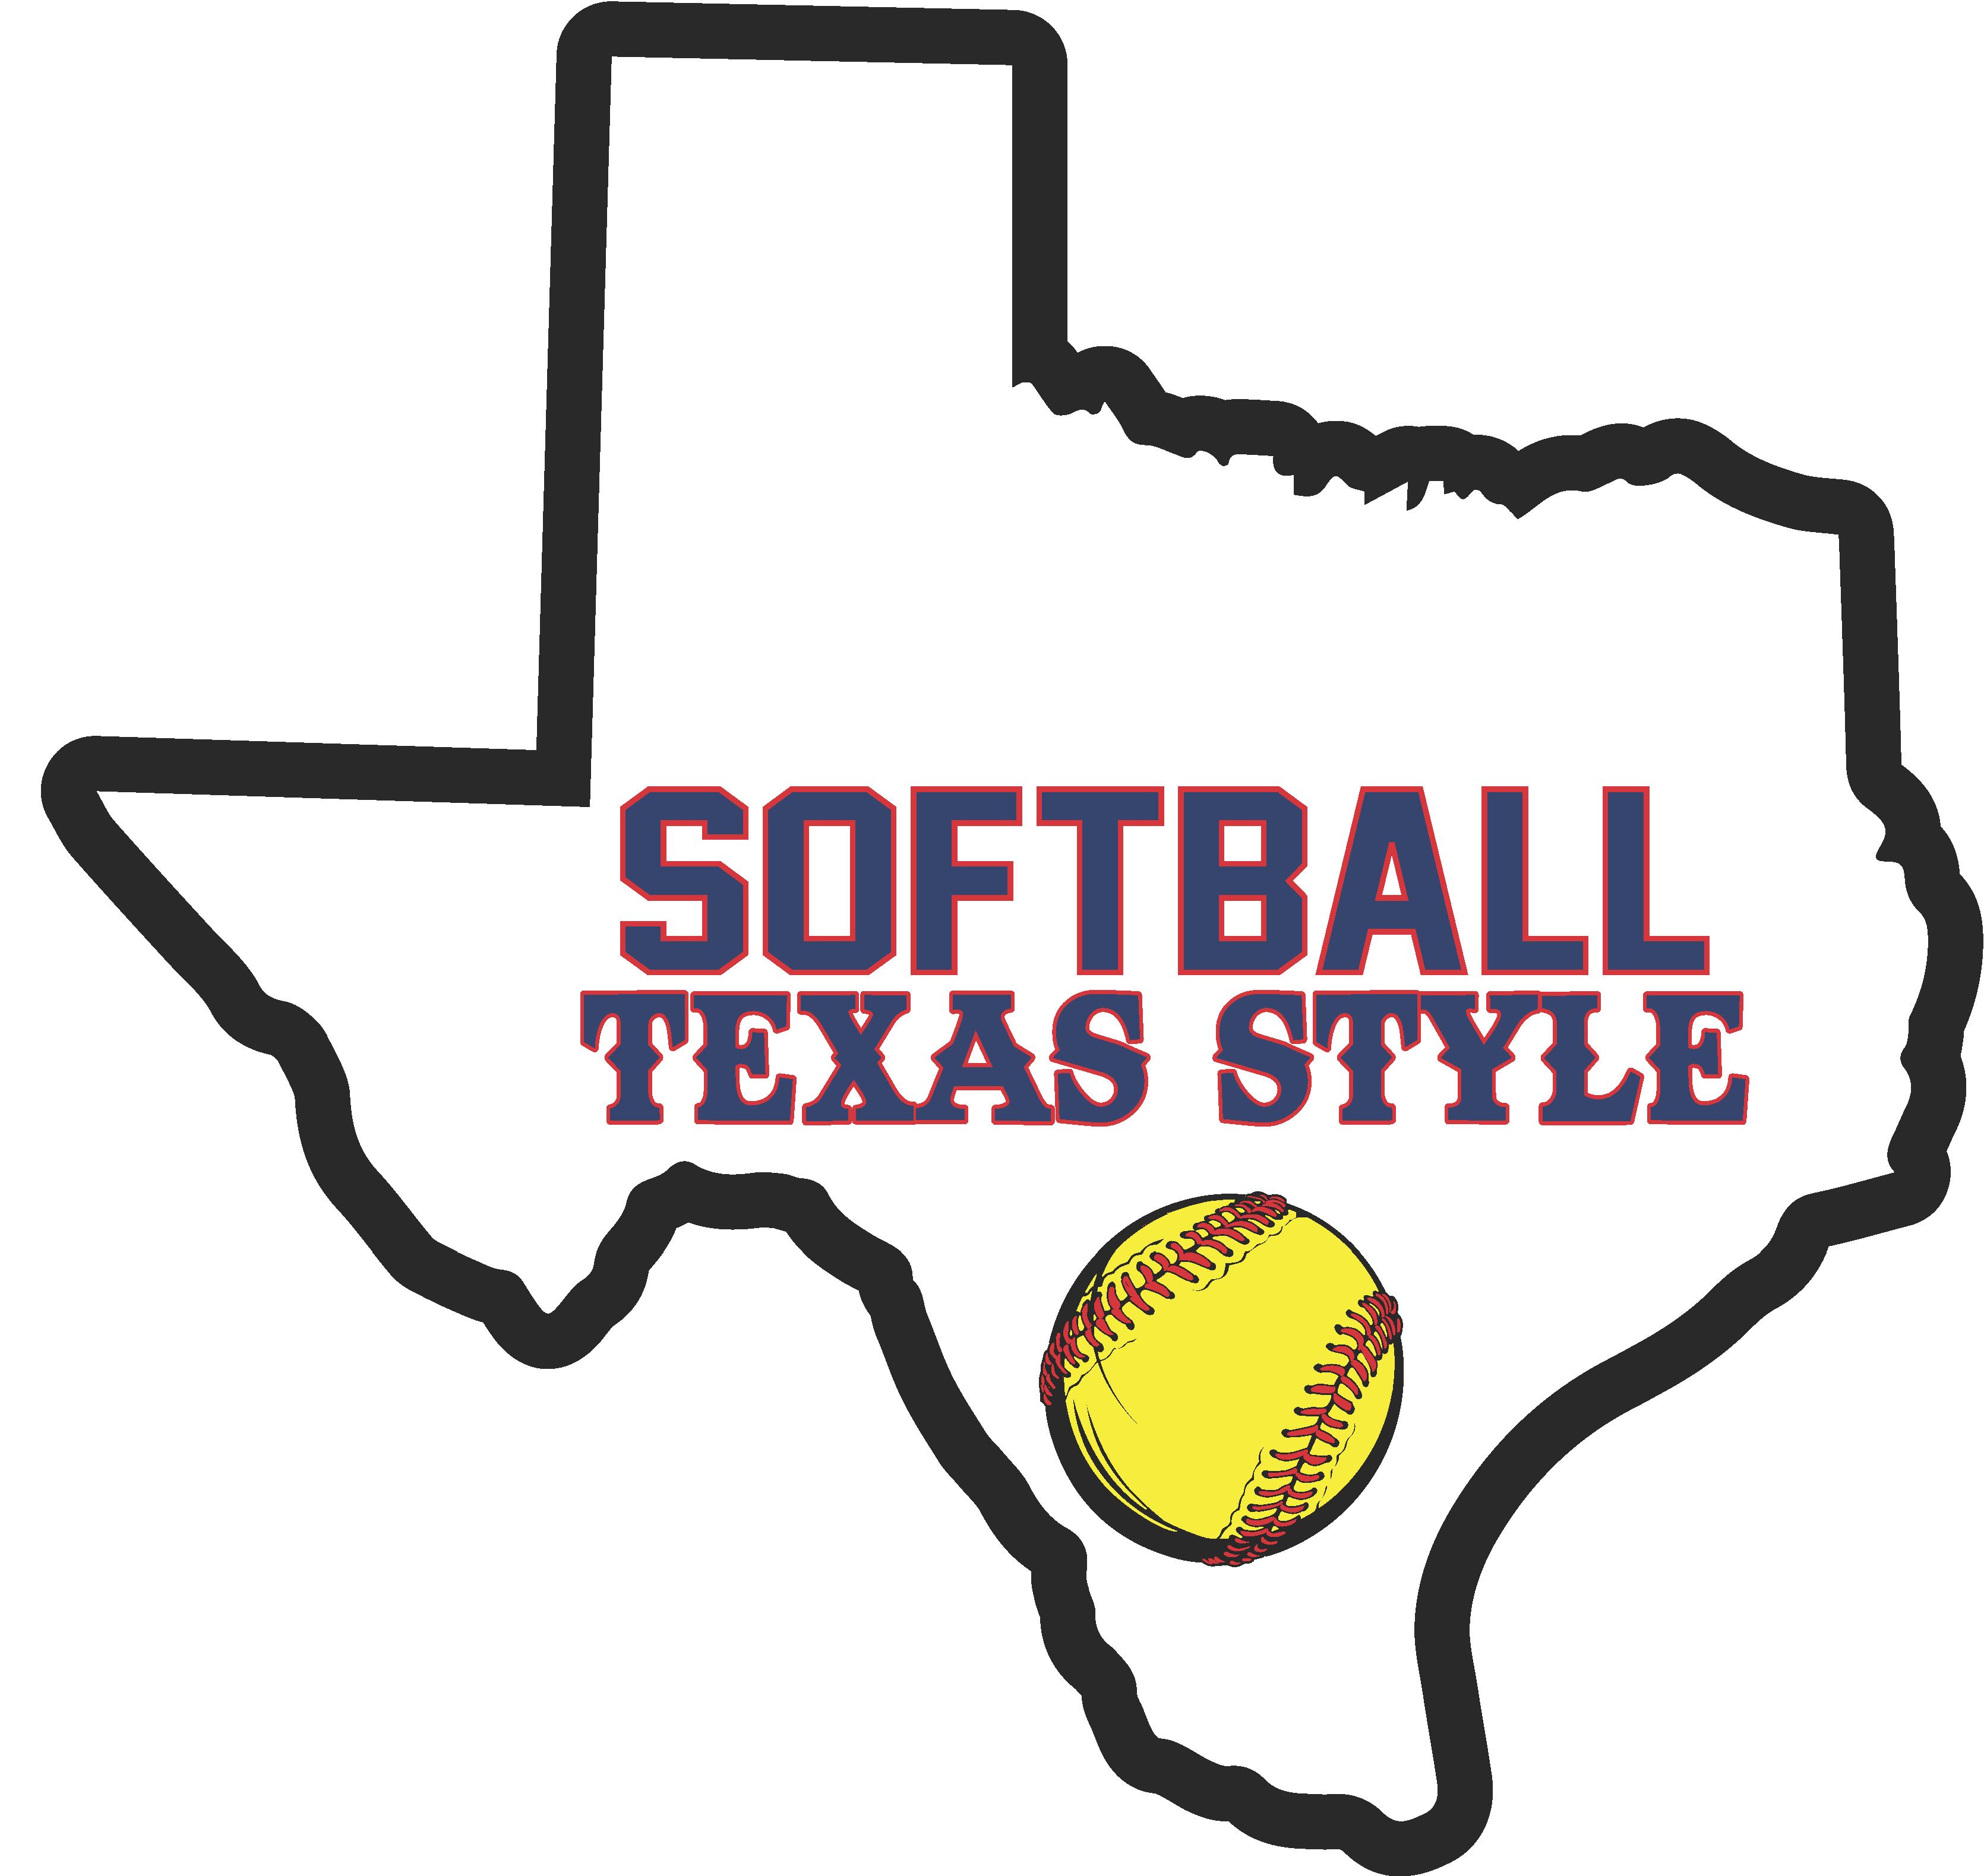 Softball Texas Style Fall Seniors Classic Logo